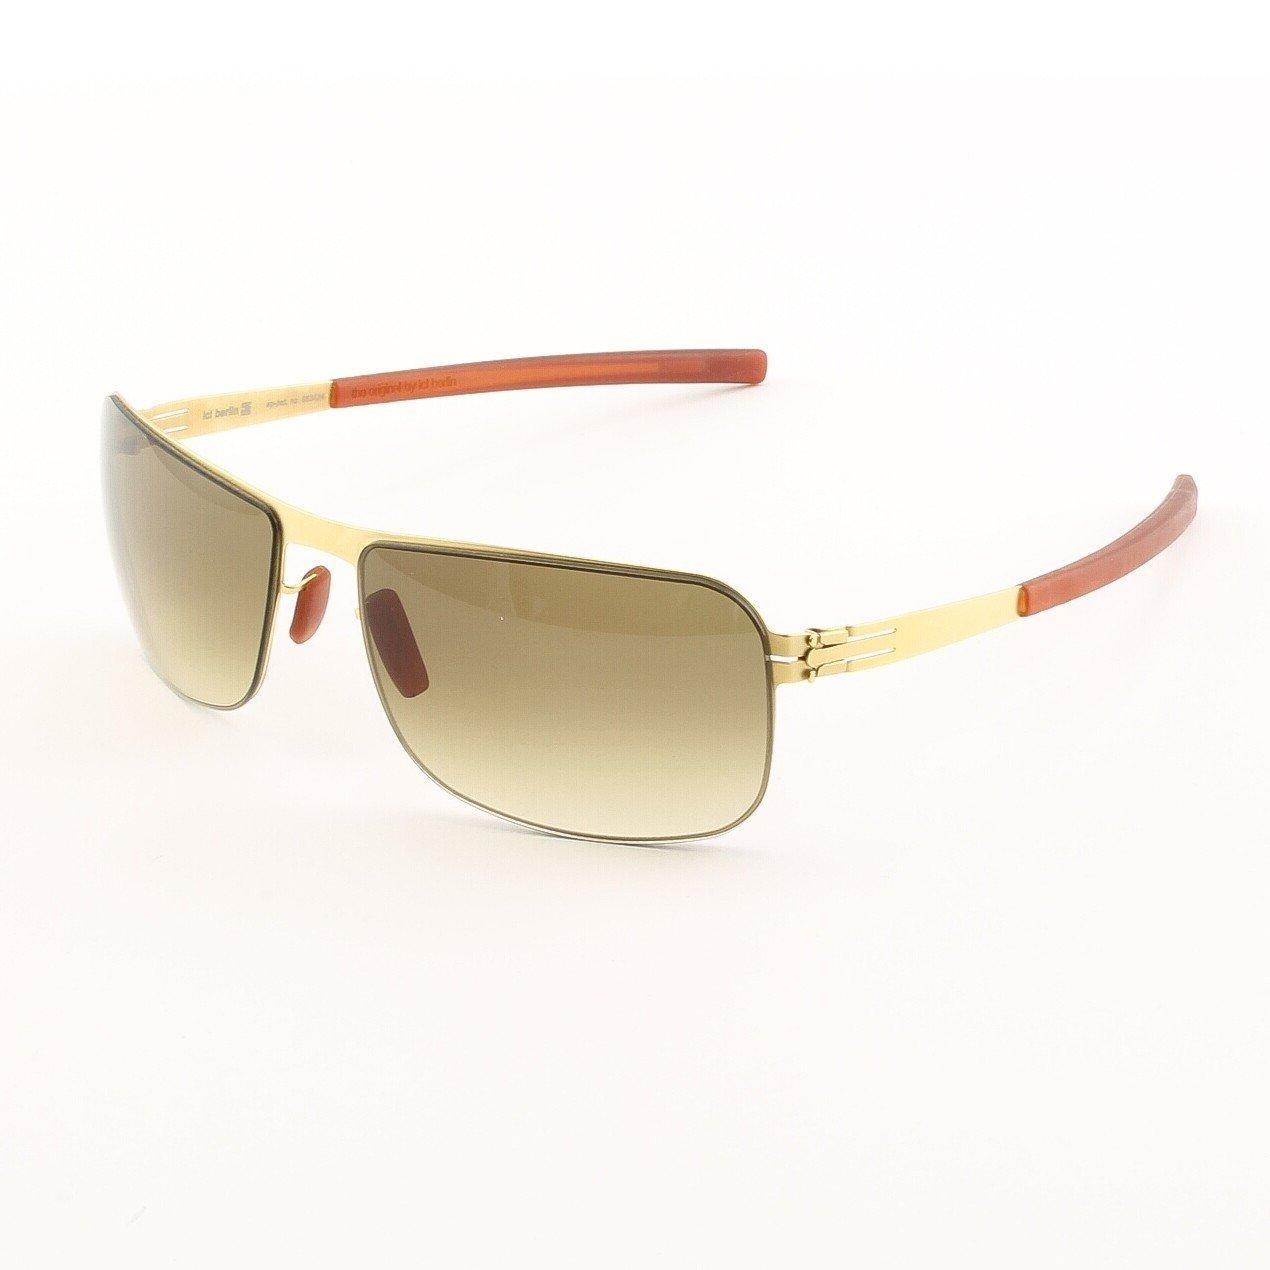 ic! Berlin Erik Sunglasses Col. Gold with Brown Gradient Lenses